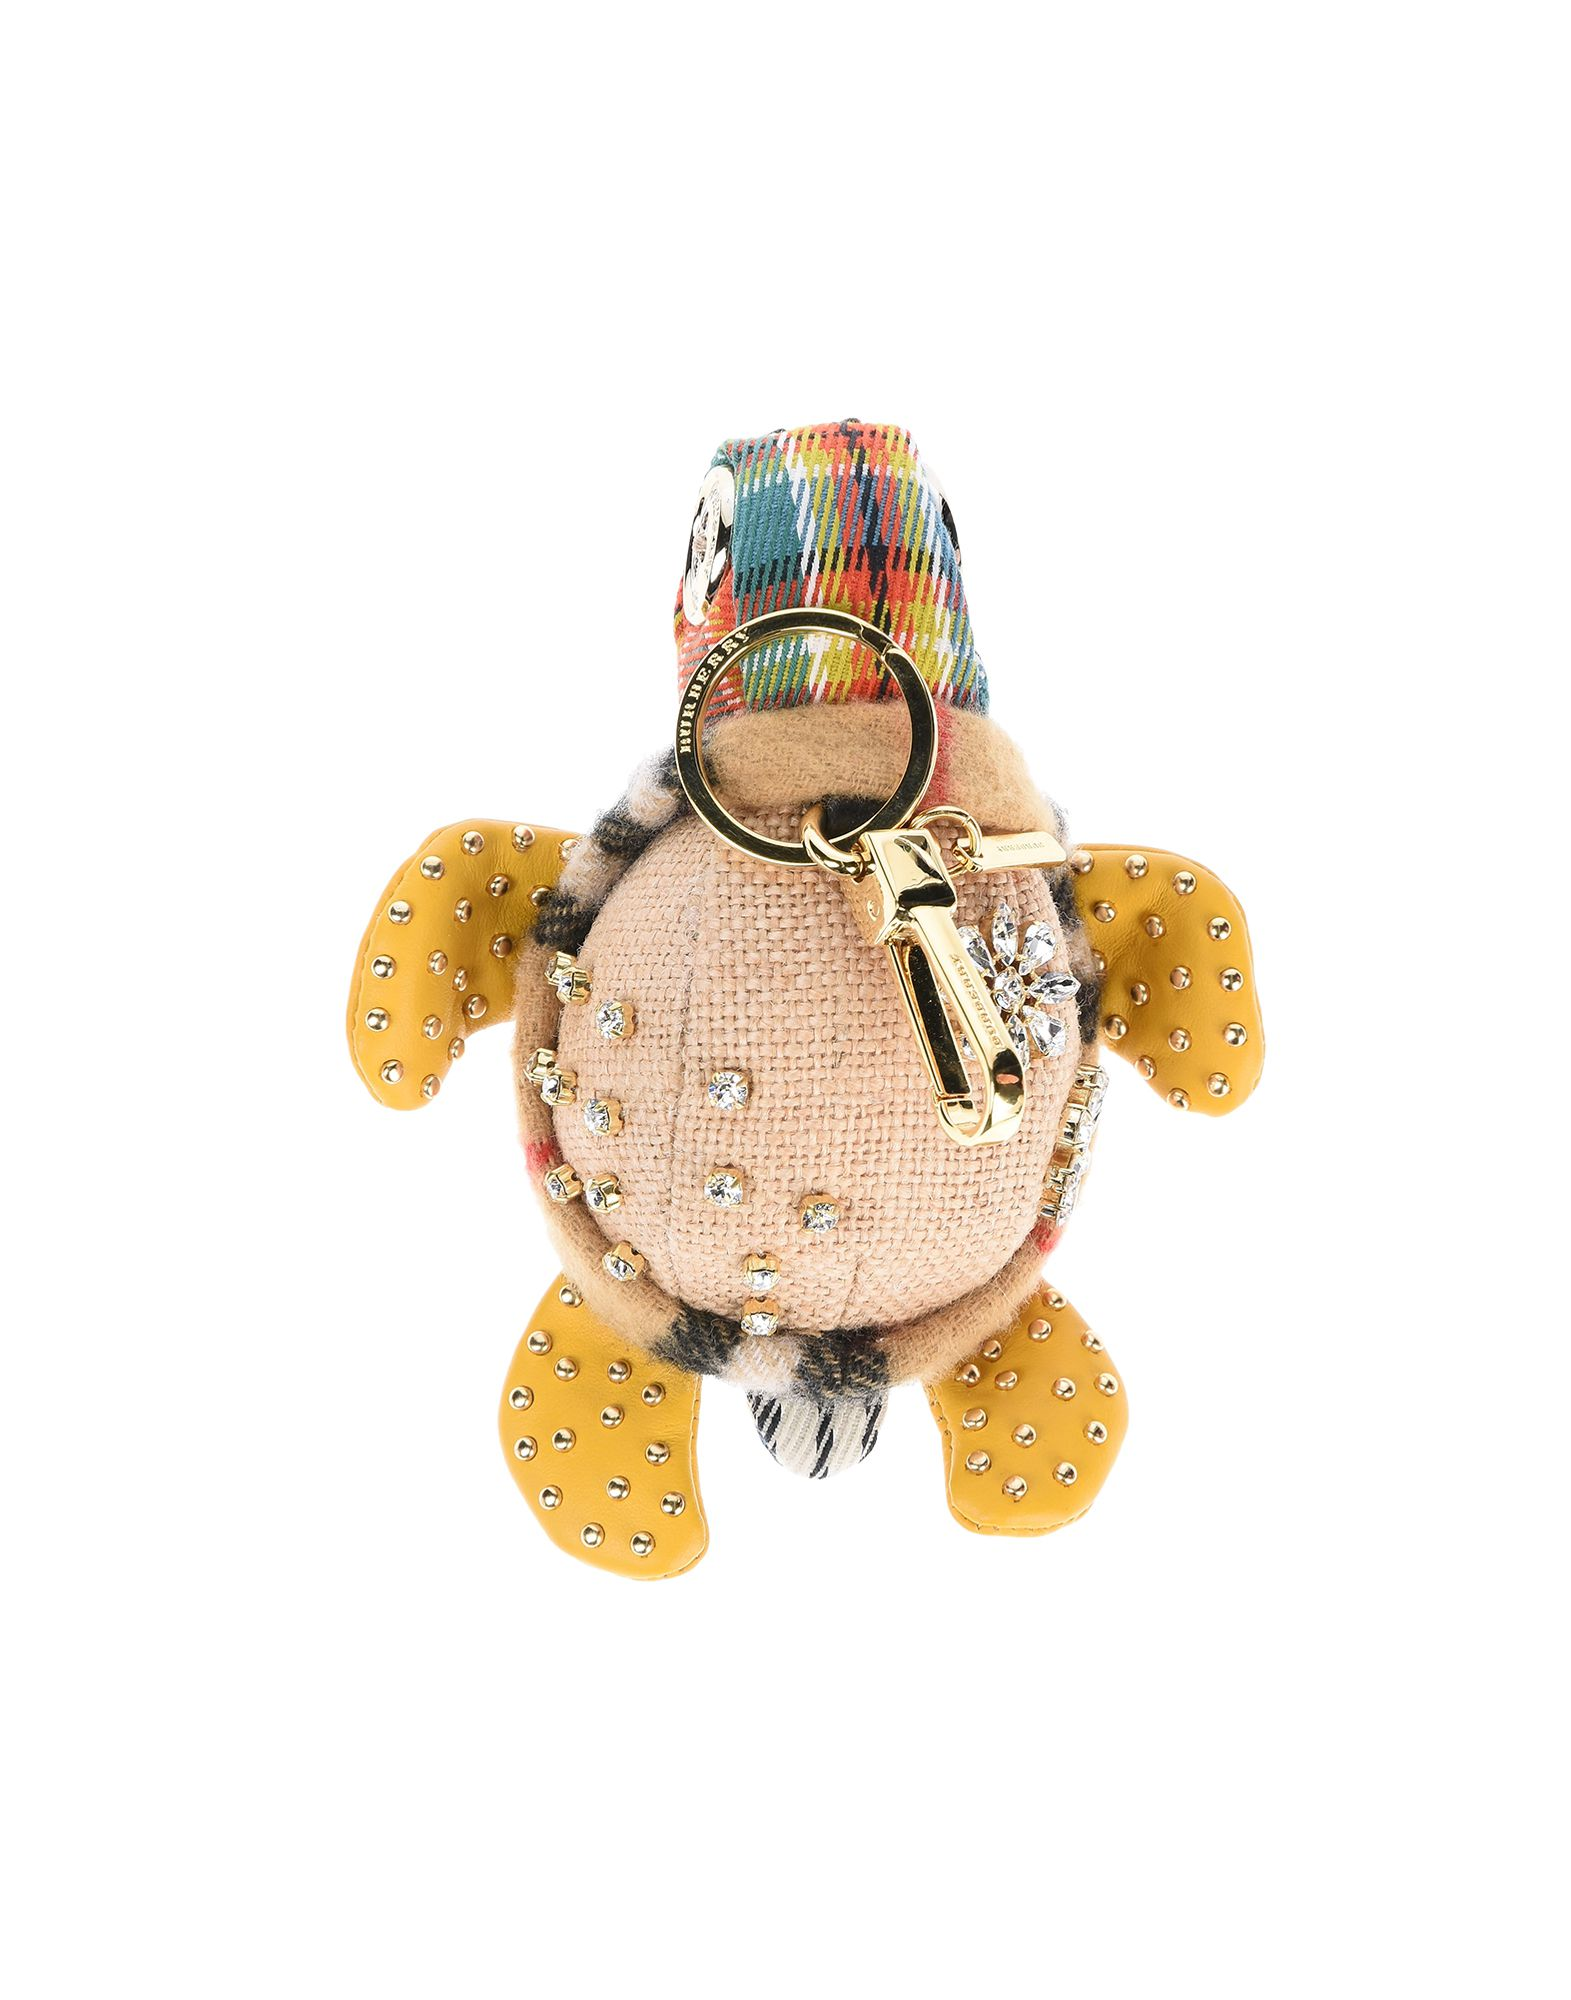 BURBERRY Брелок для ключей jobon zhongyin брелок для ключей кольцо для ключей цепочка цепочка волокно кожа ребенок мать весна талия висит тип ретро черный никель zb 116b